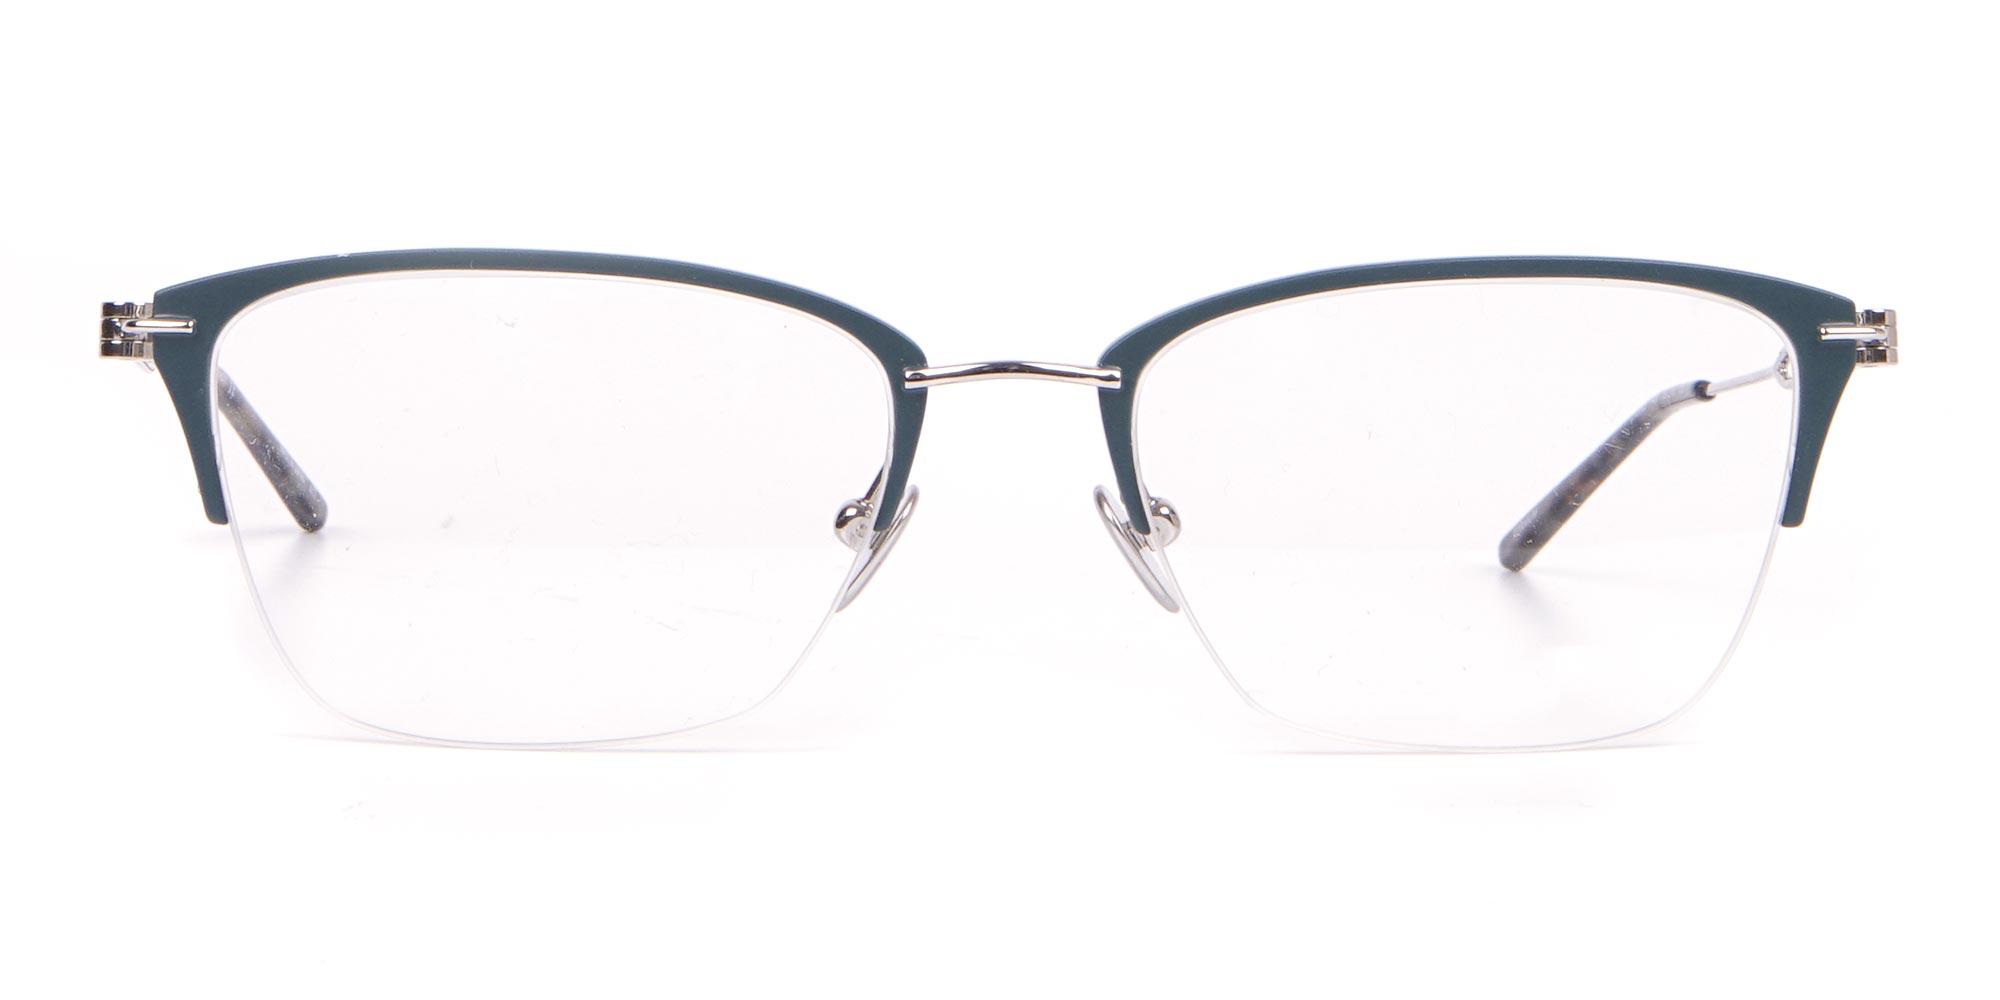 Calvin Klein Matte Teal Glasses in Half-Rim